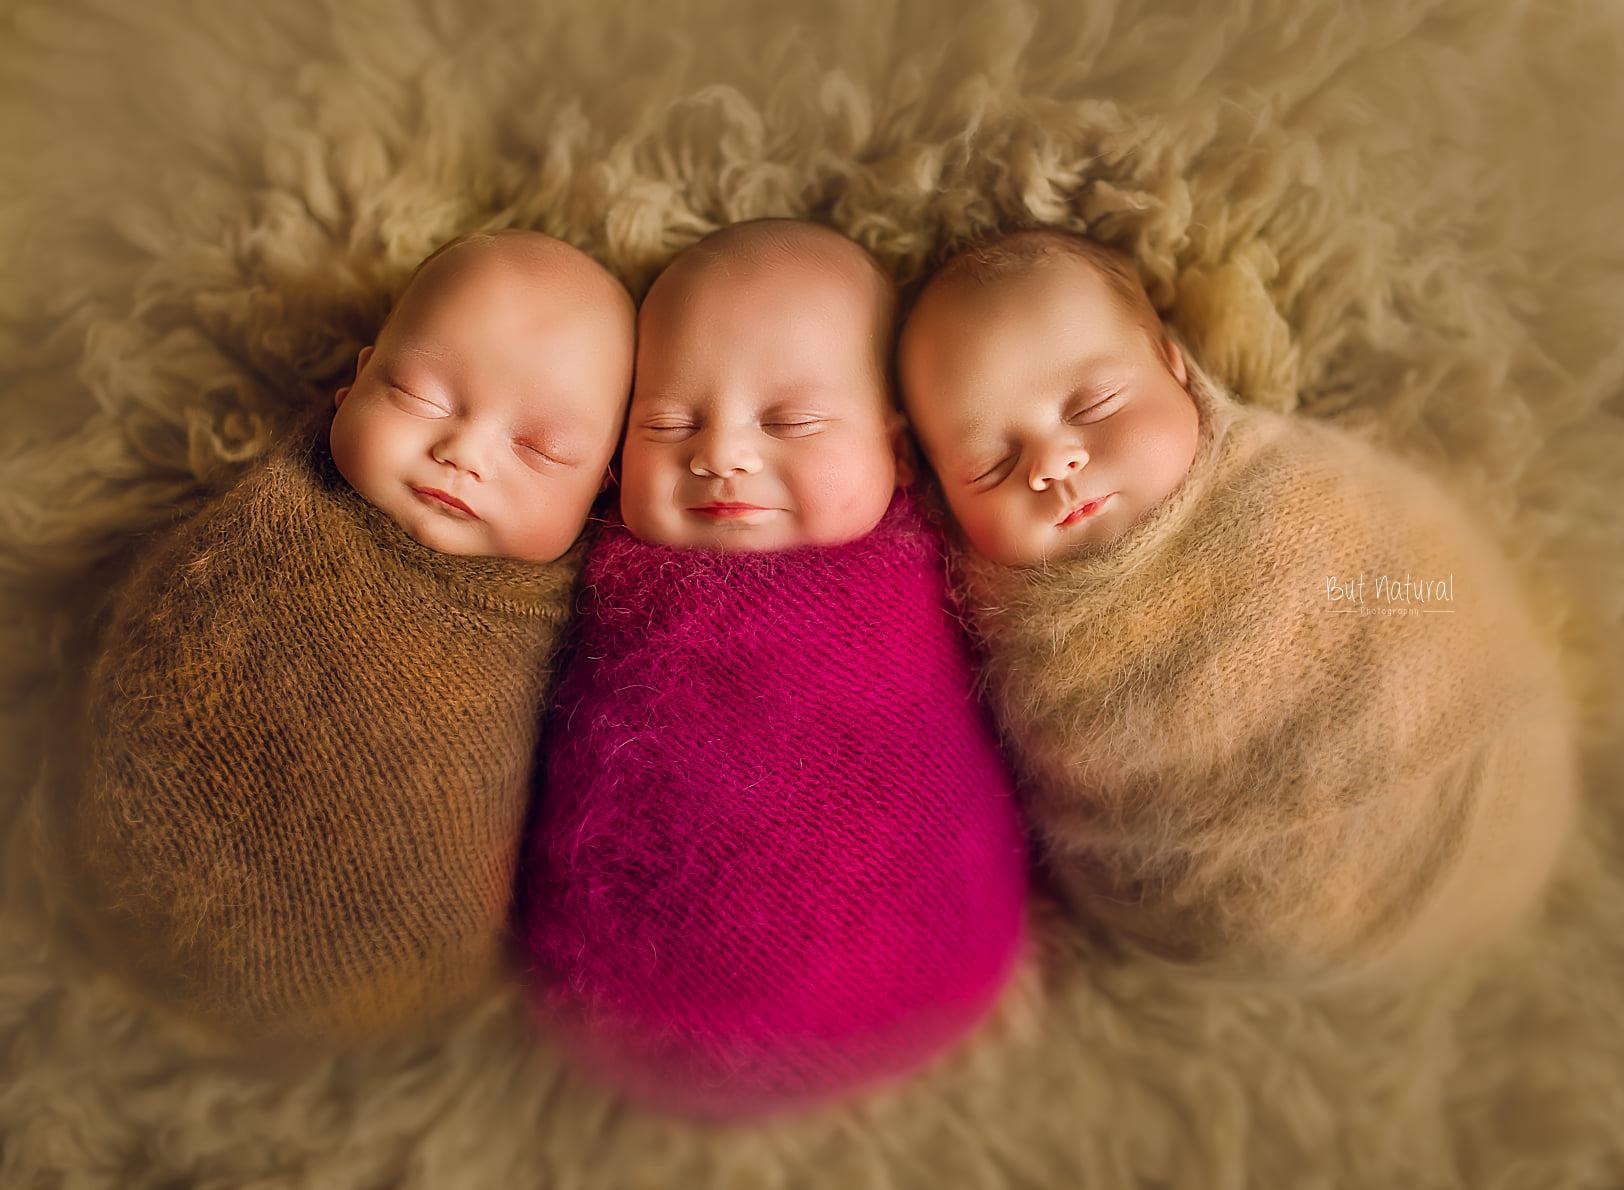 Newborn photography by Sujata Setia